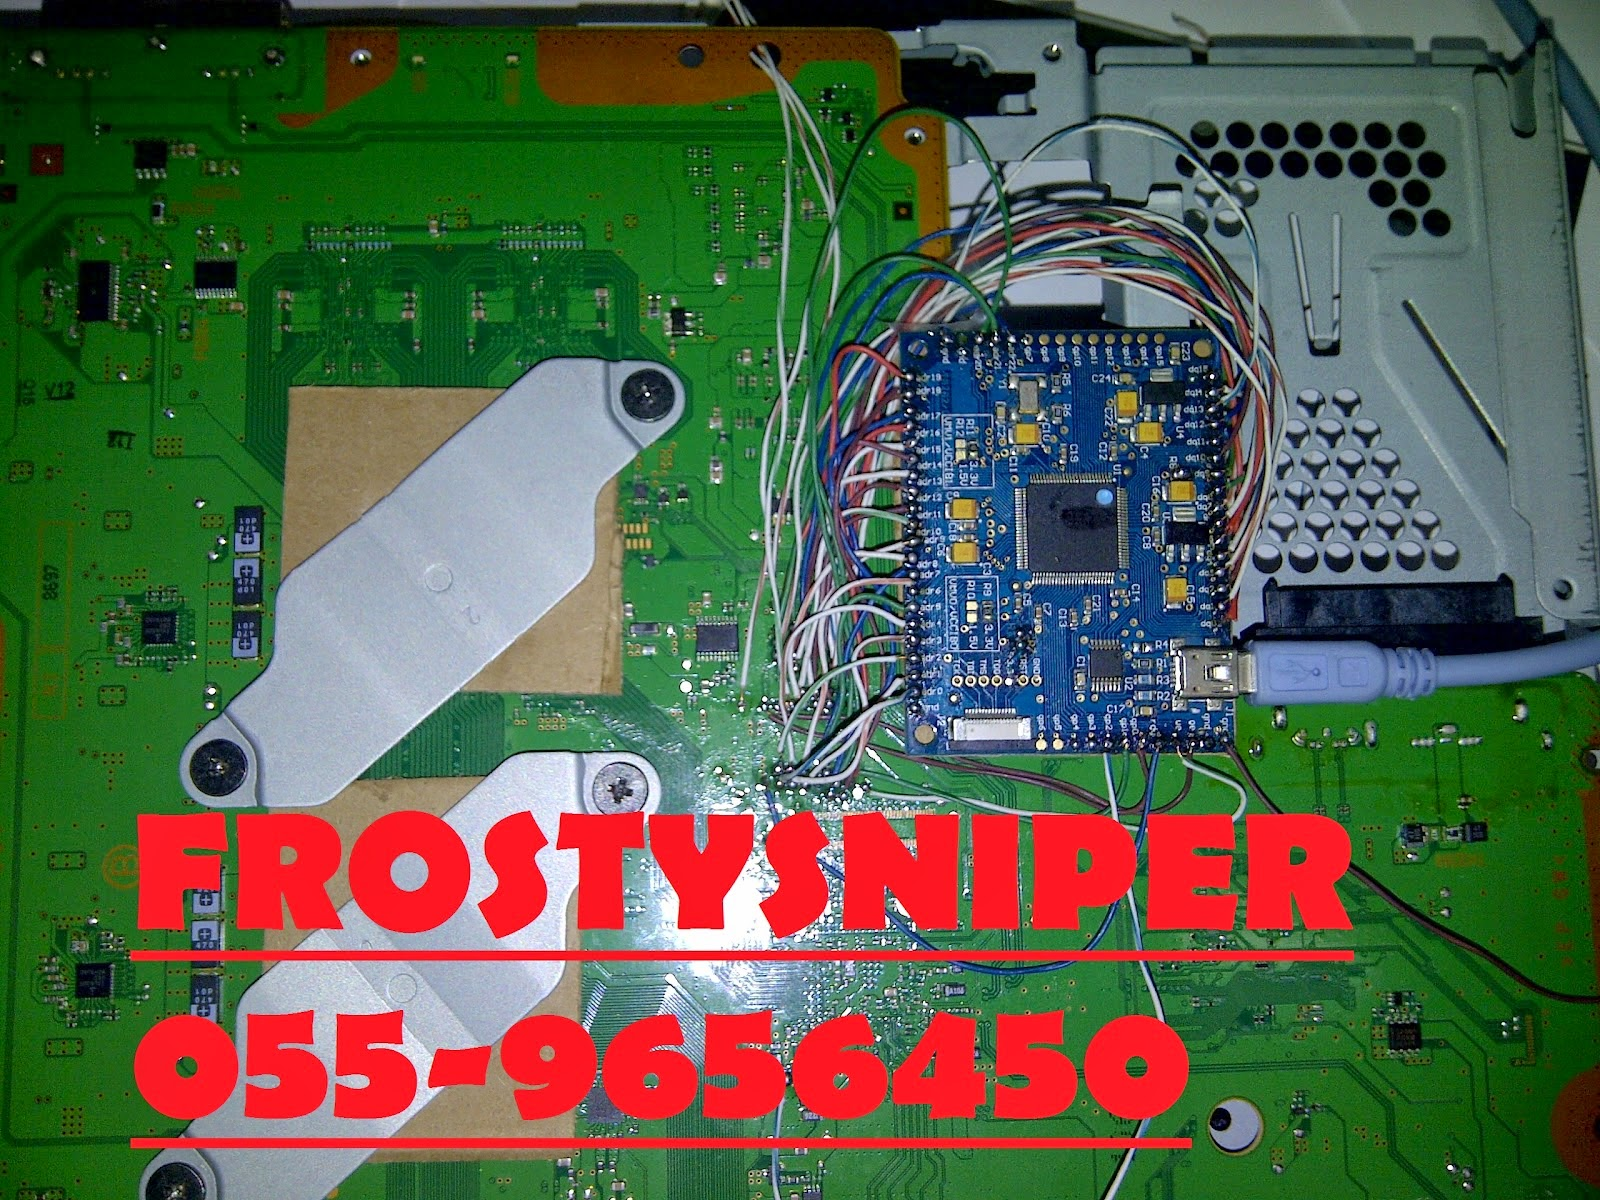 ps3 downgrade software download